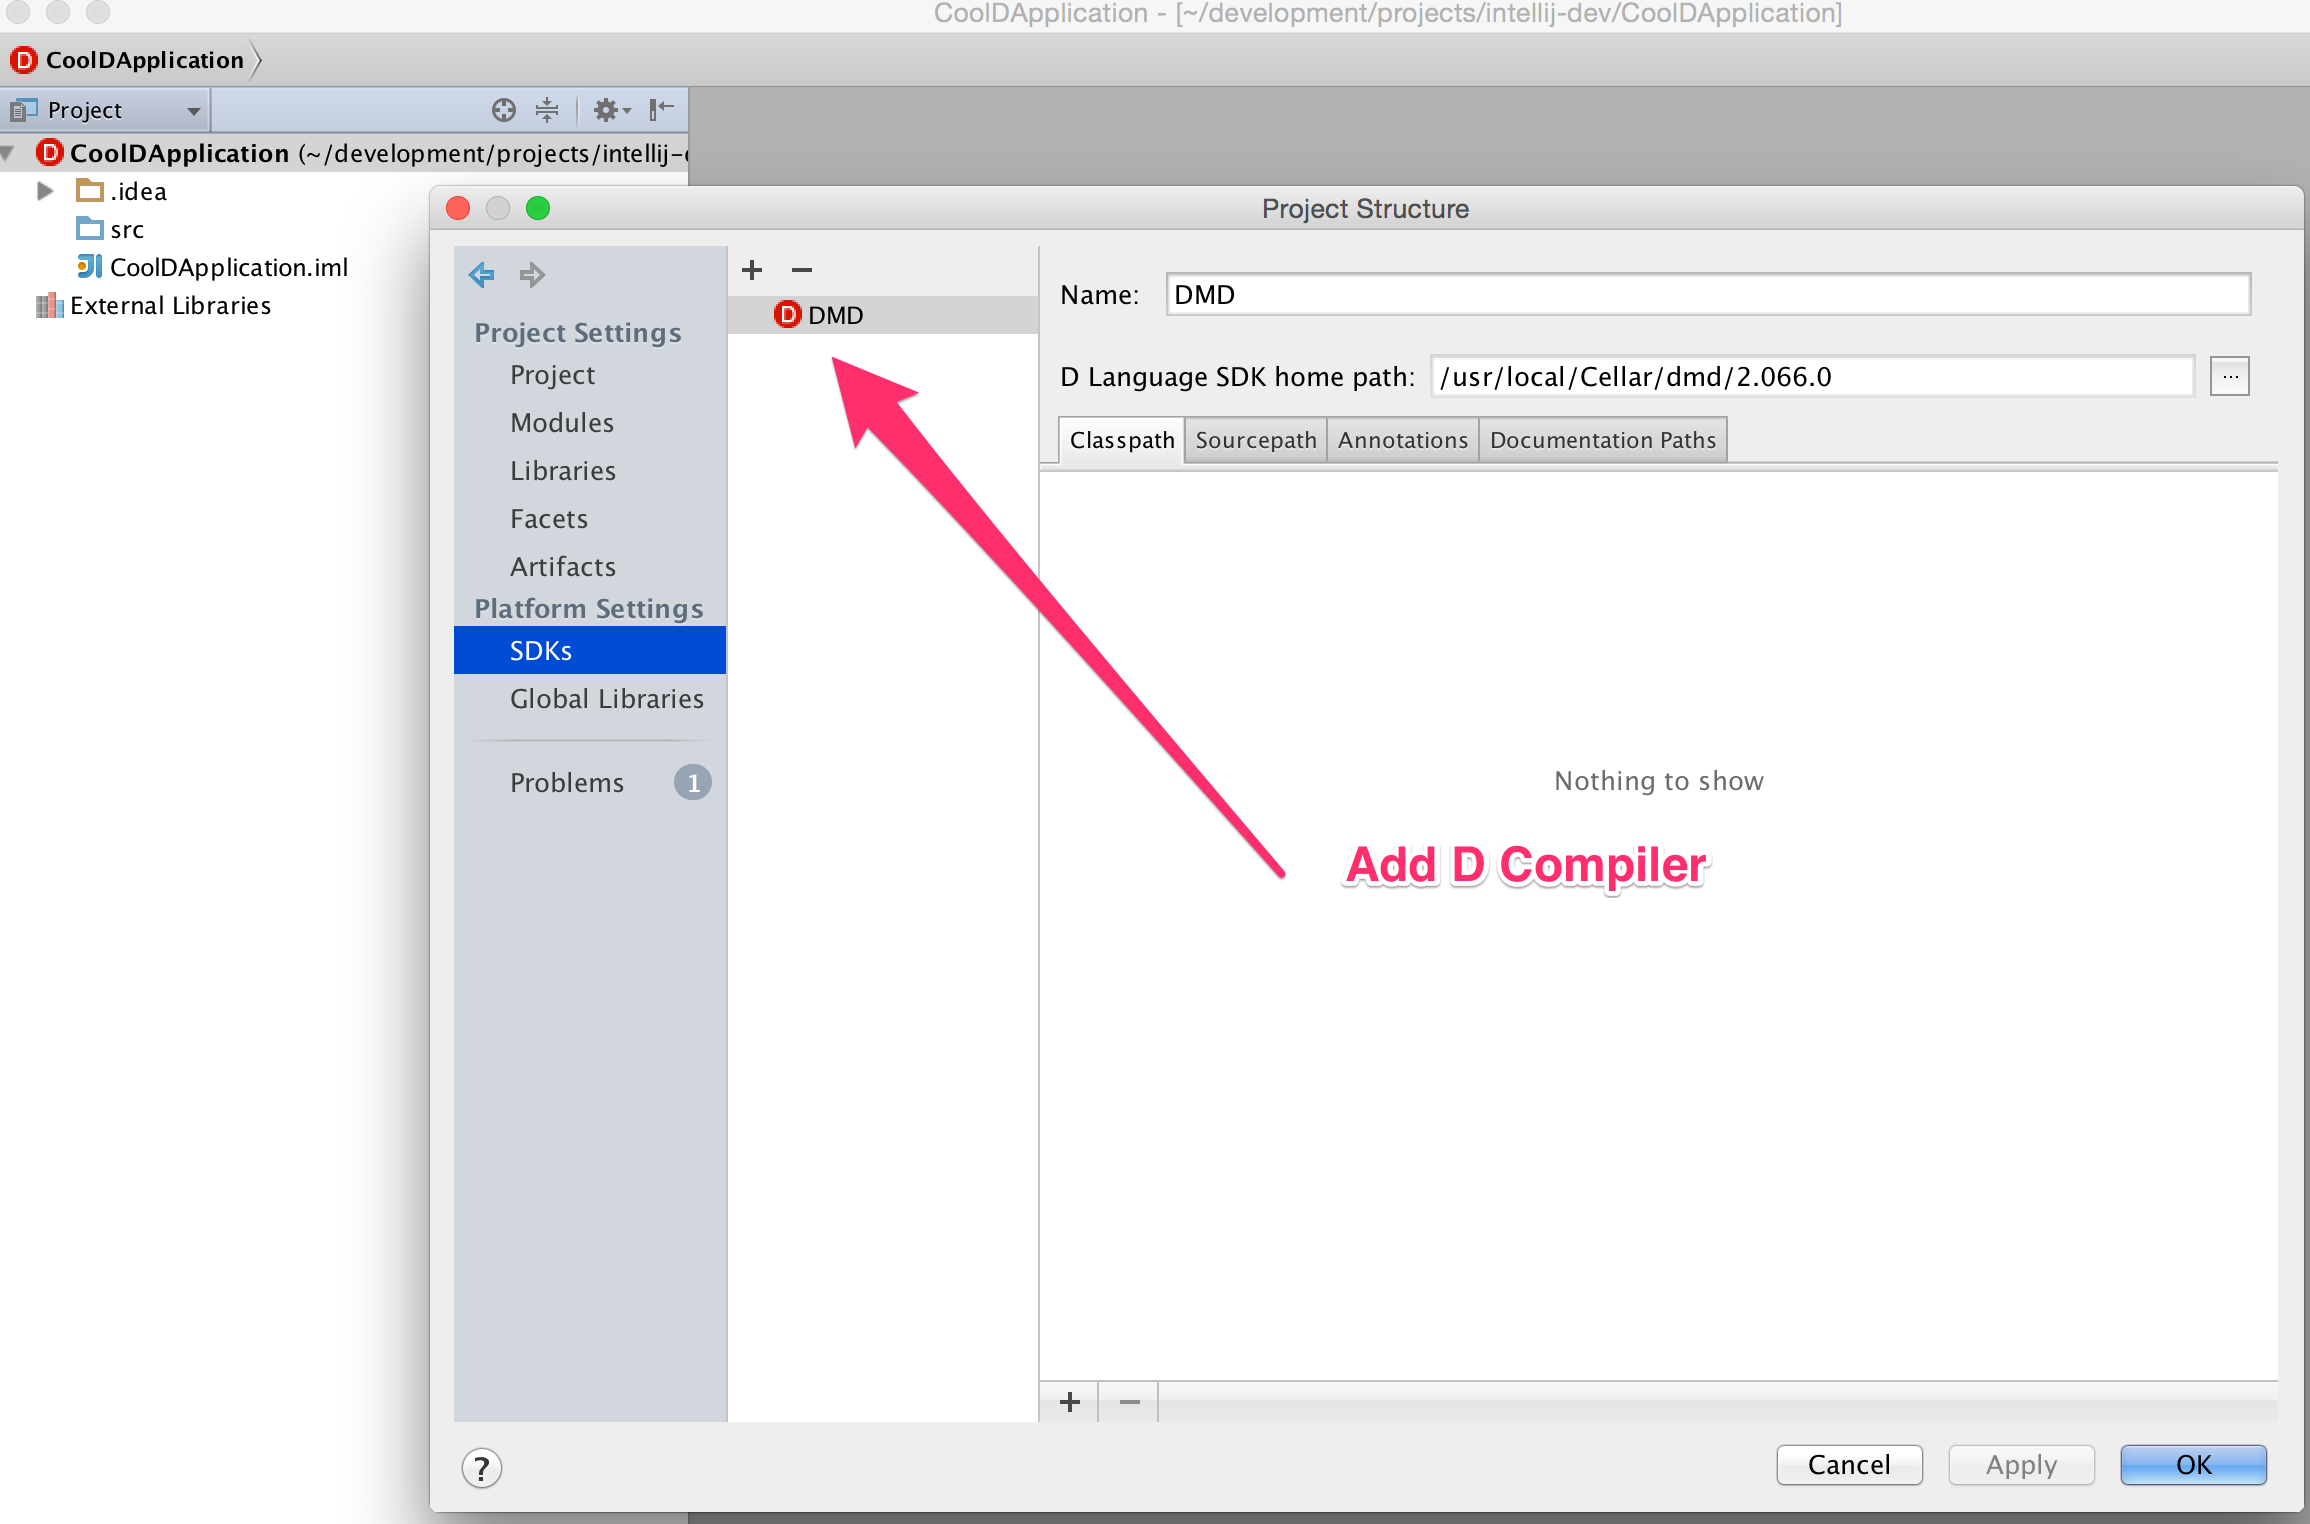 module settings add d compiler